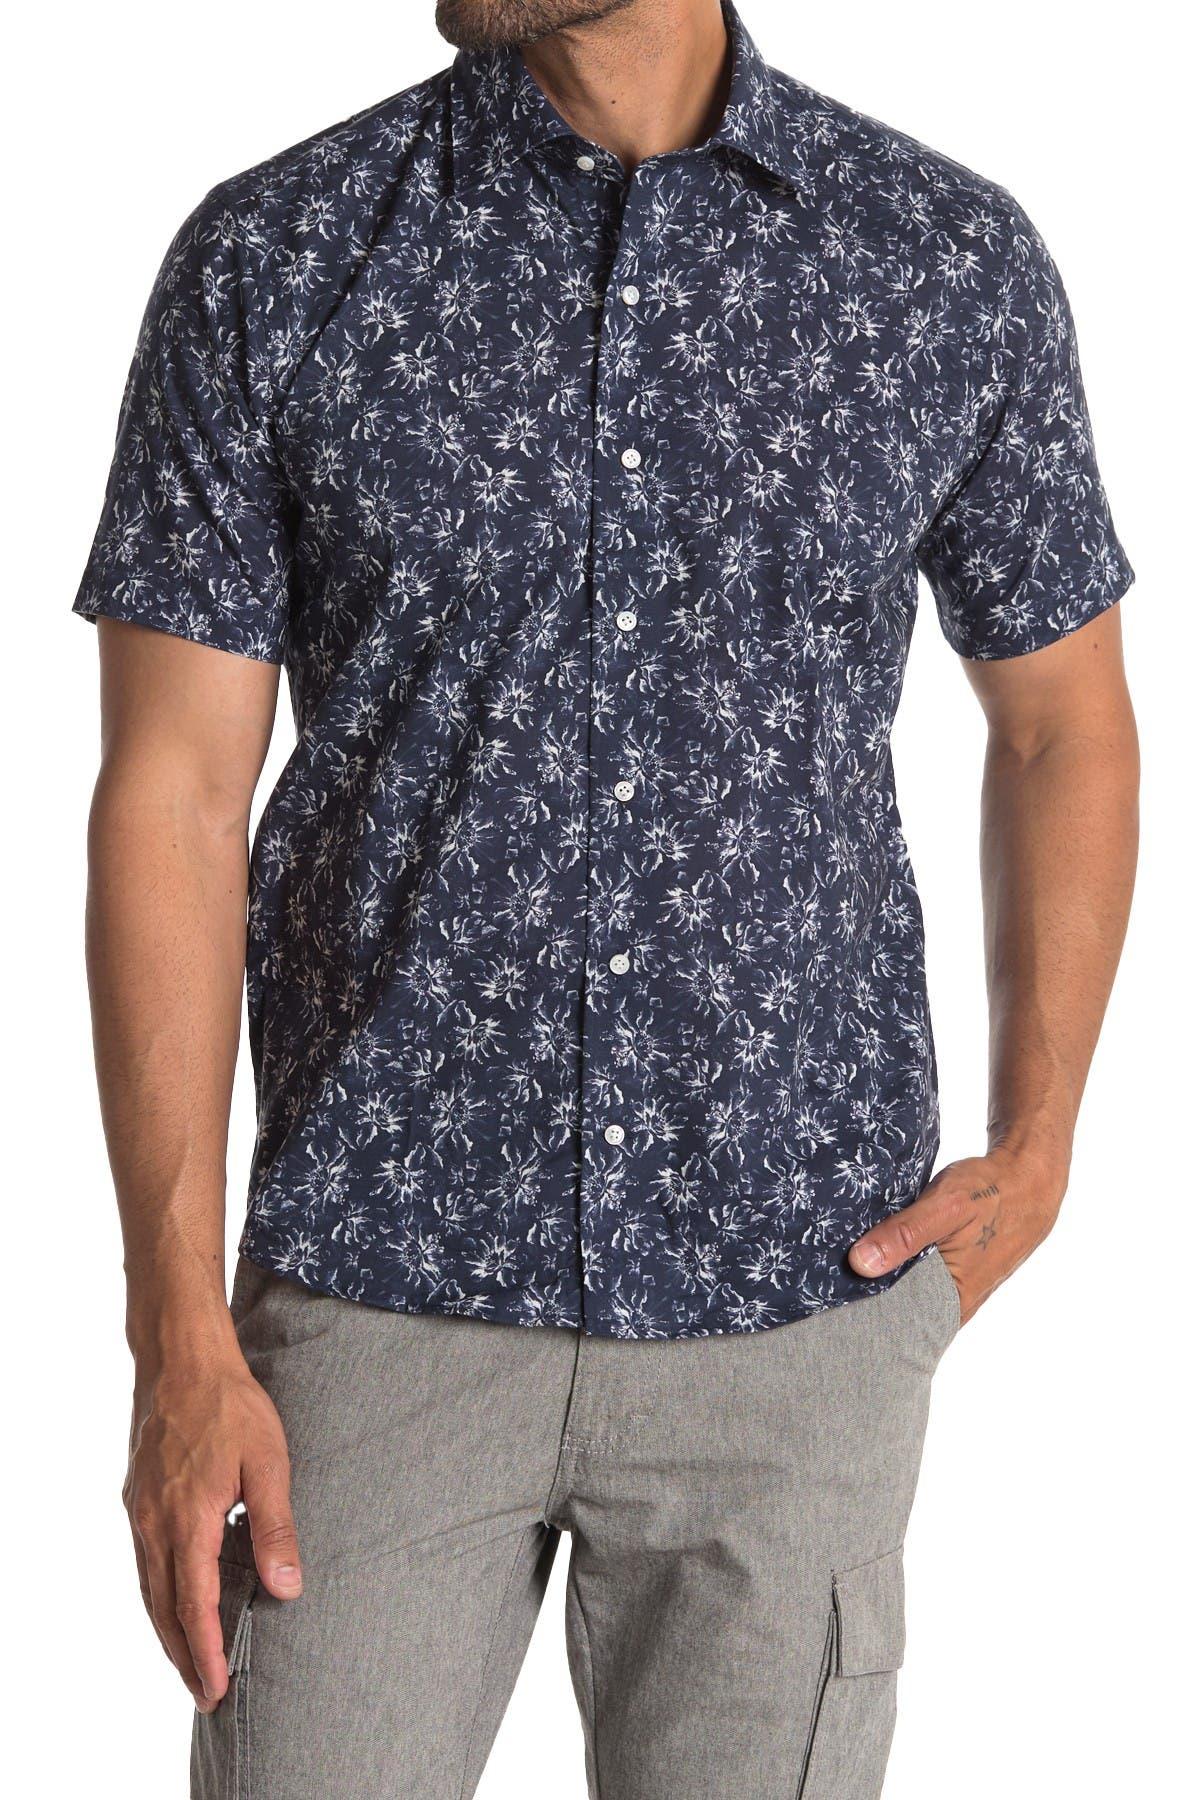 Image of Peter Millar Gairdini Floral Short Sleeve Shirt